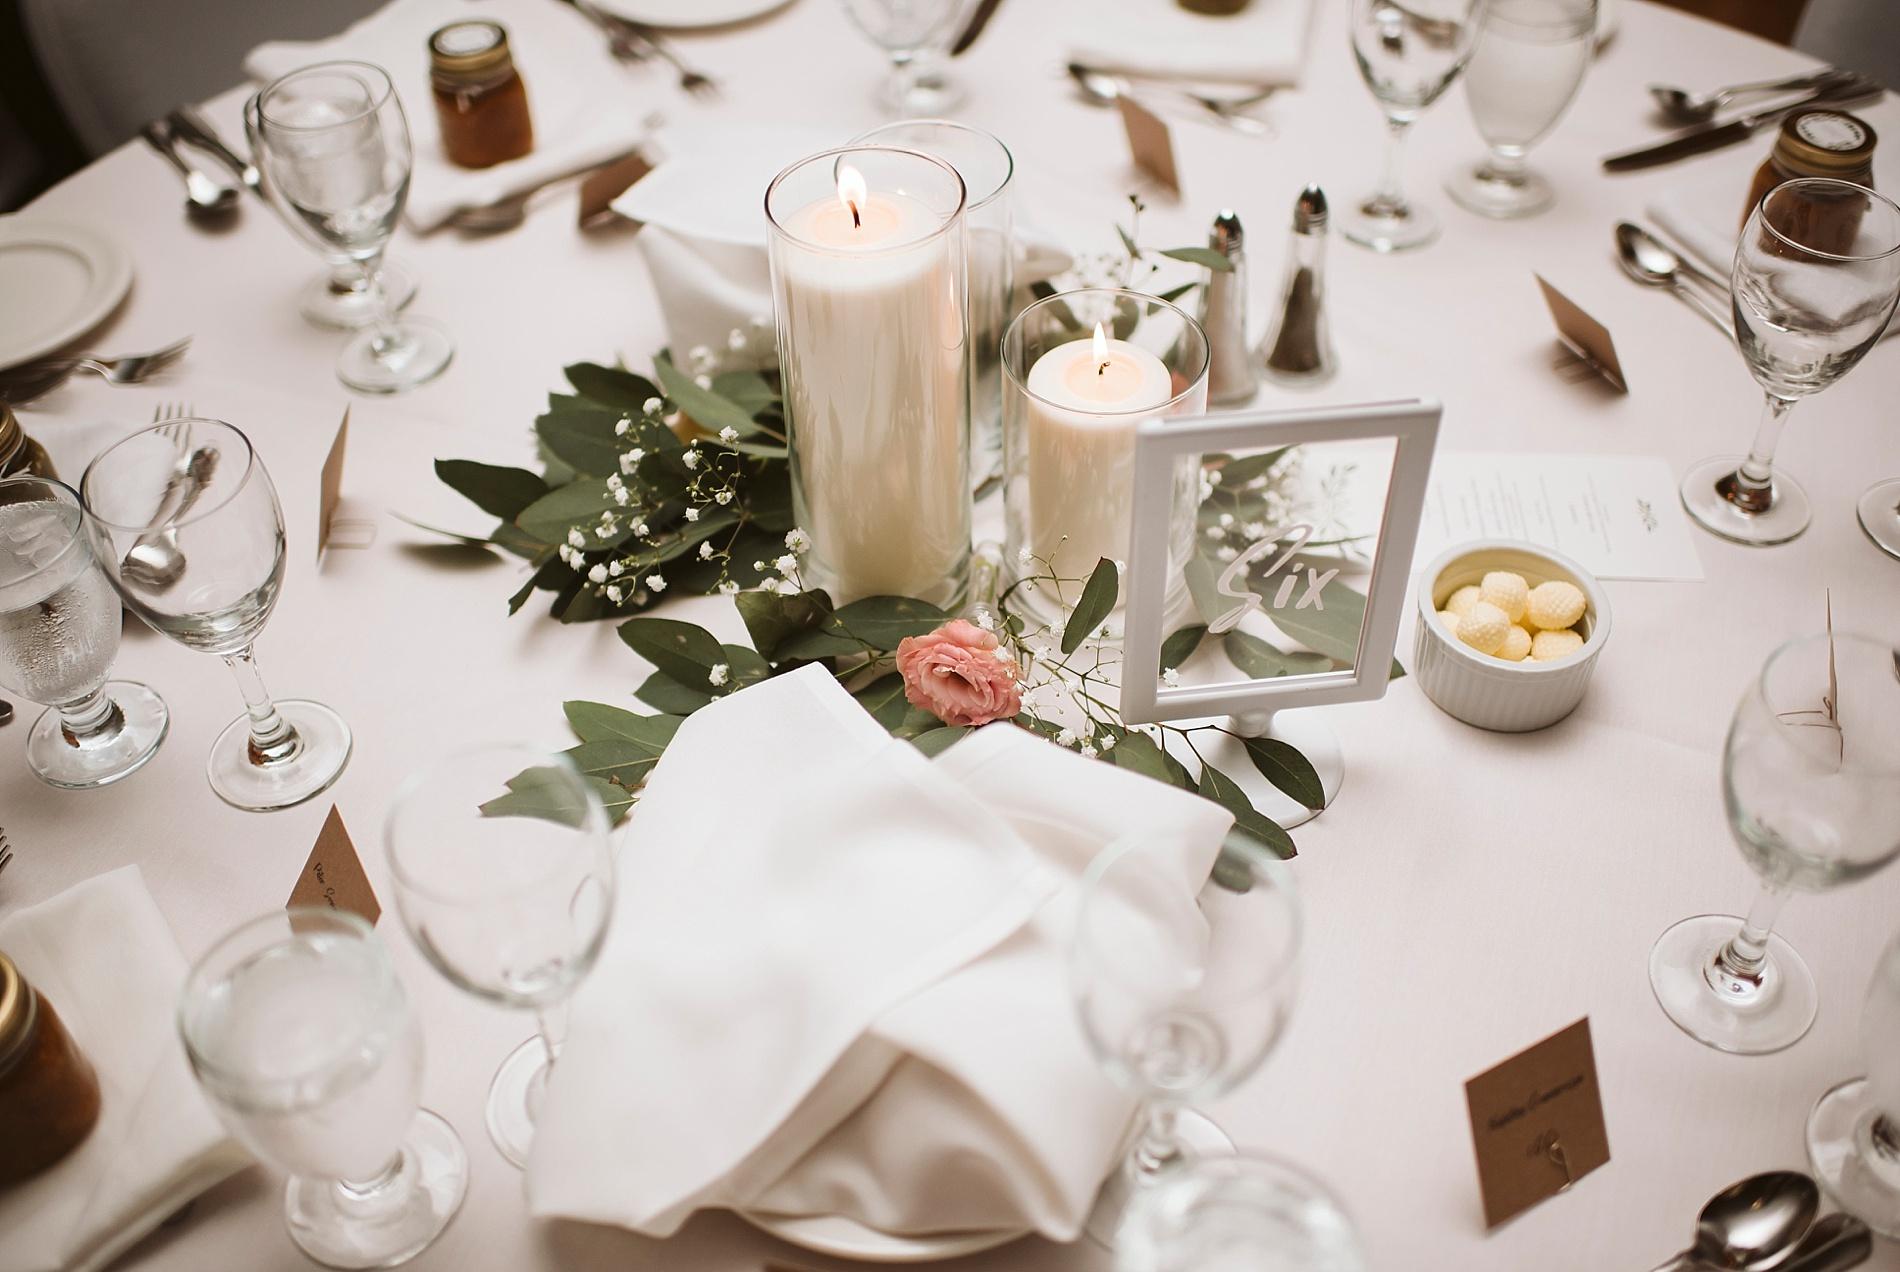 Kawartha_Lakes_Wedding_Bobcageon_Eganridge_Resort_Toronto_Photographer_0066.jpg